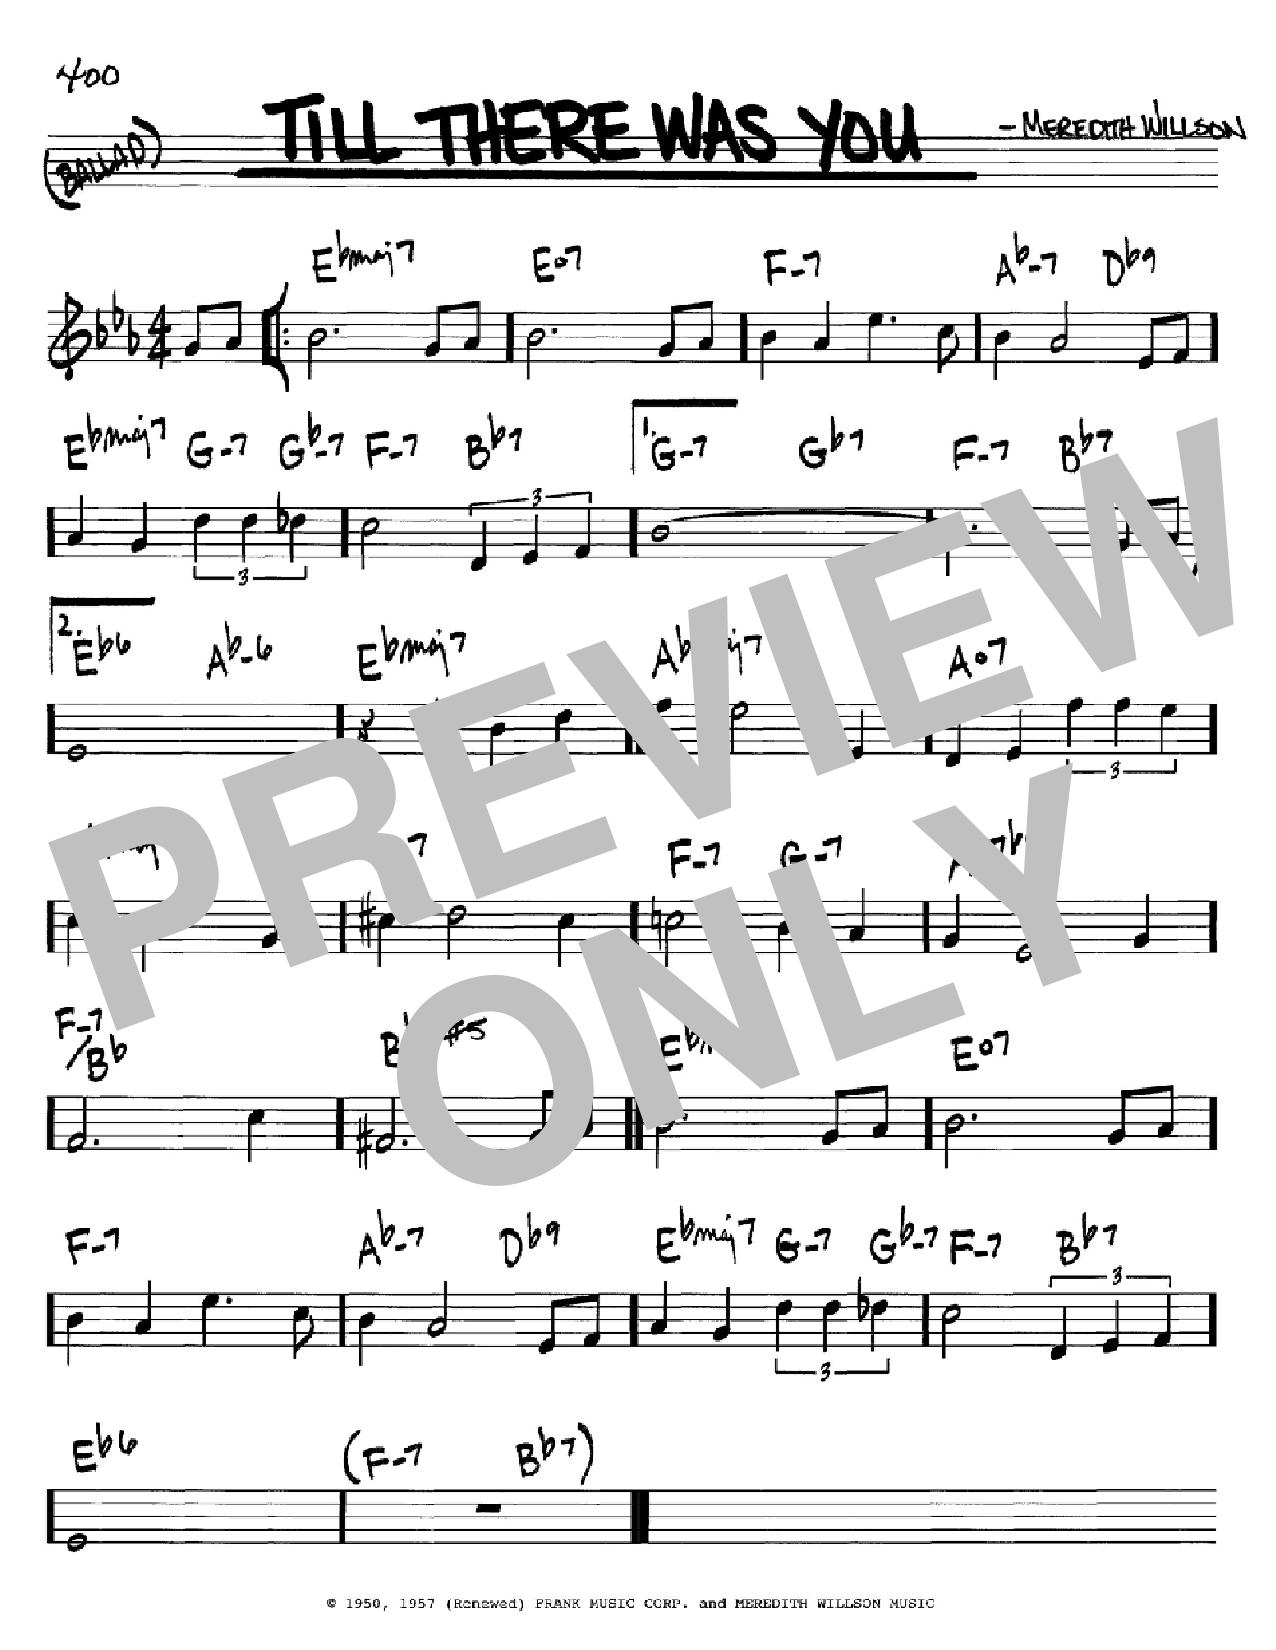 Partition autre Till There Was You de The Beatles - Real Book, Melodie et Accords, Inst. En Do